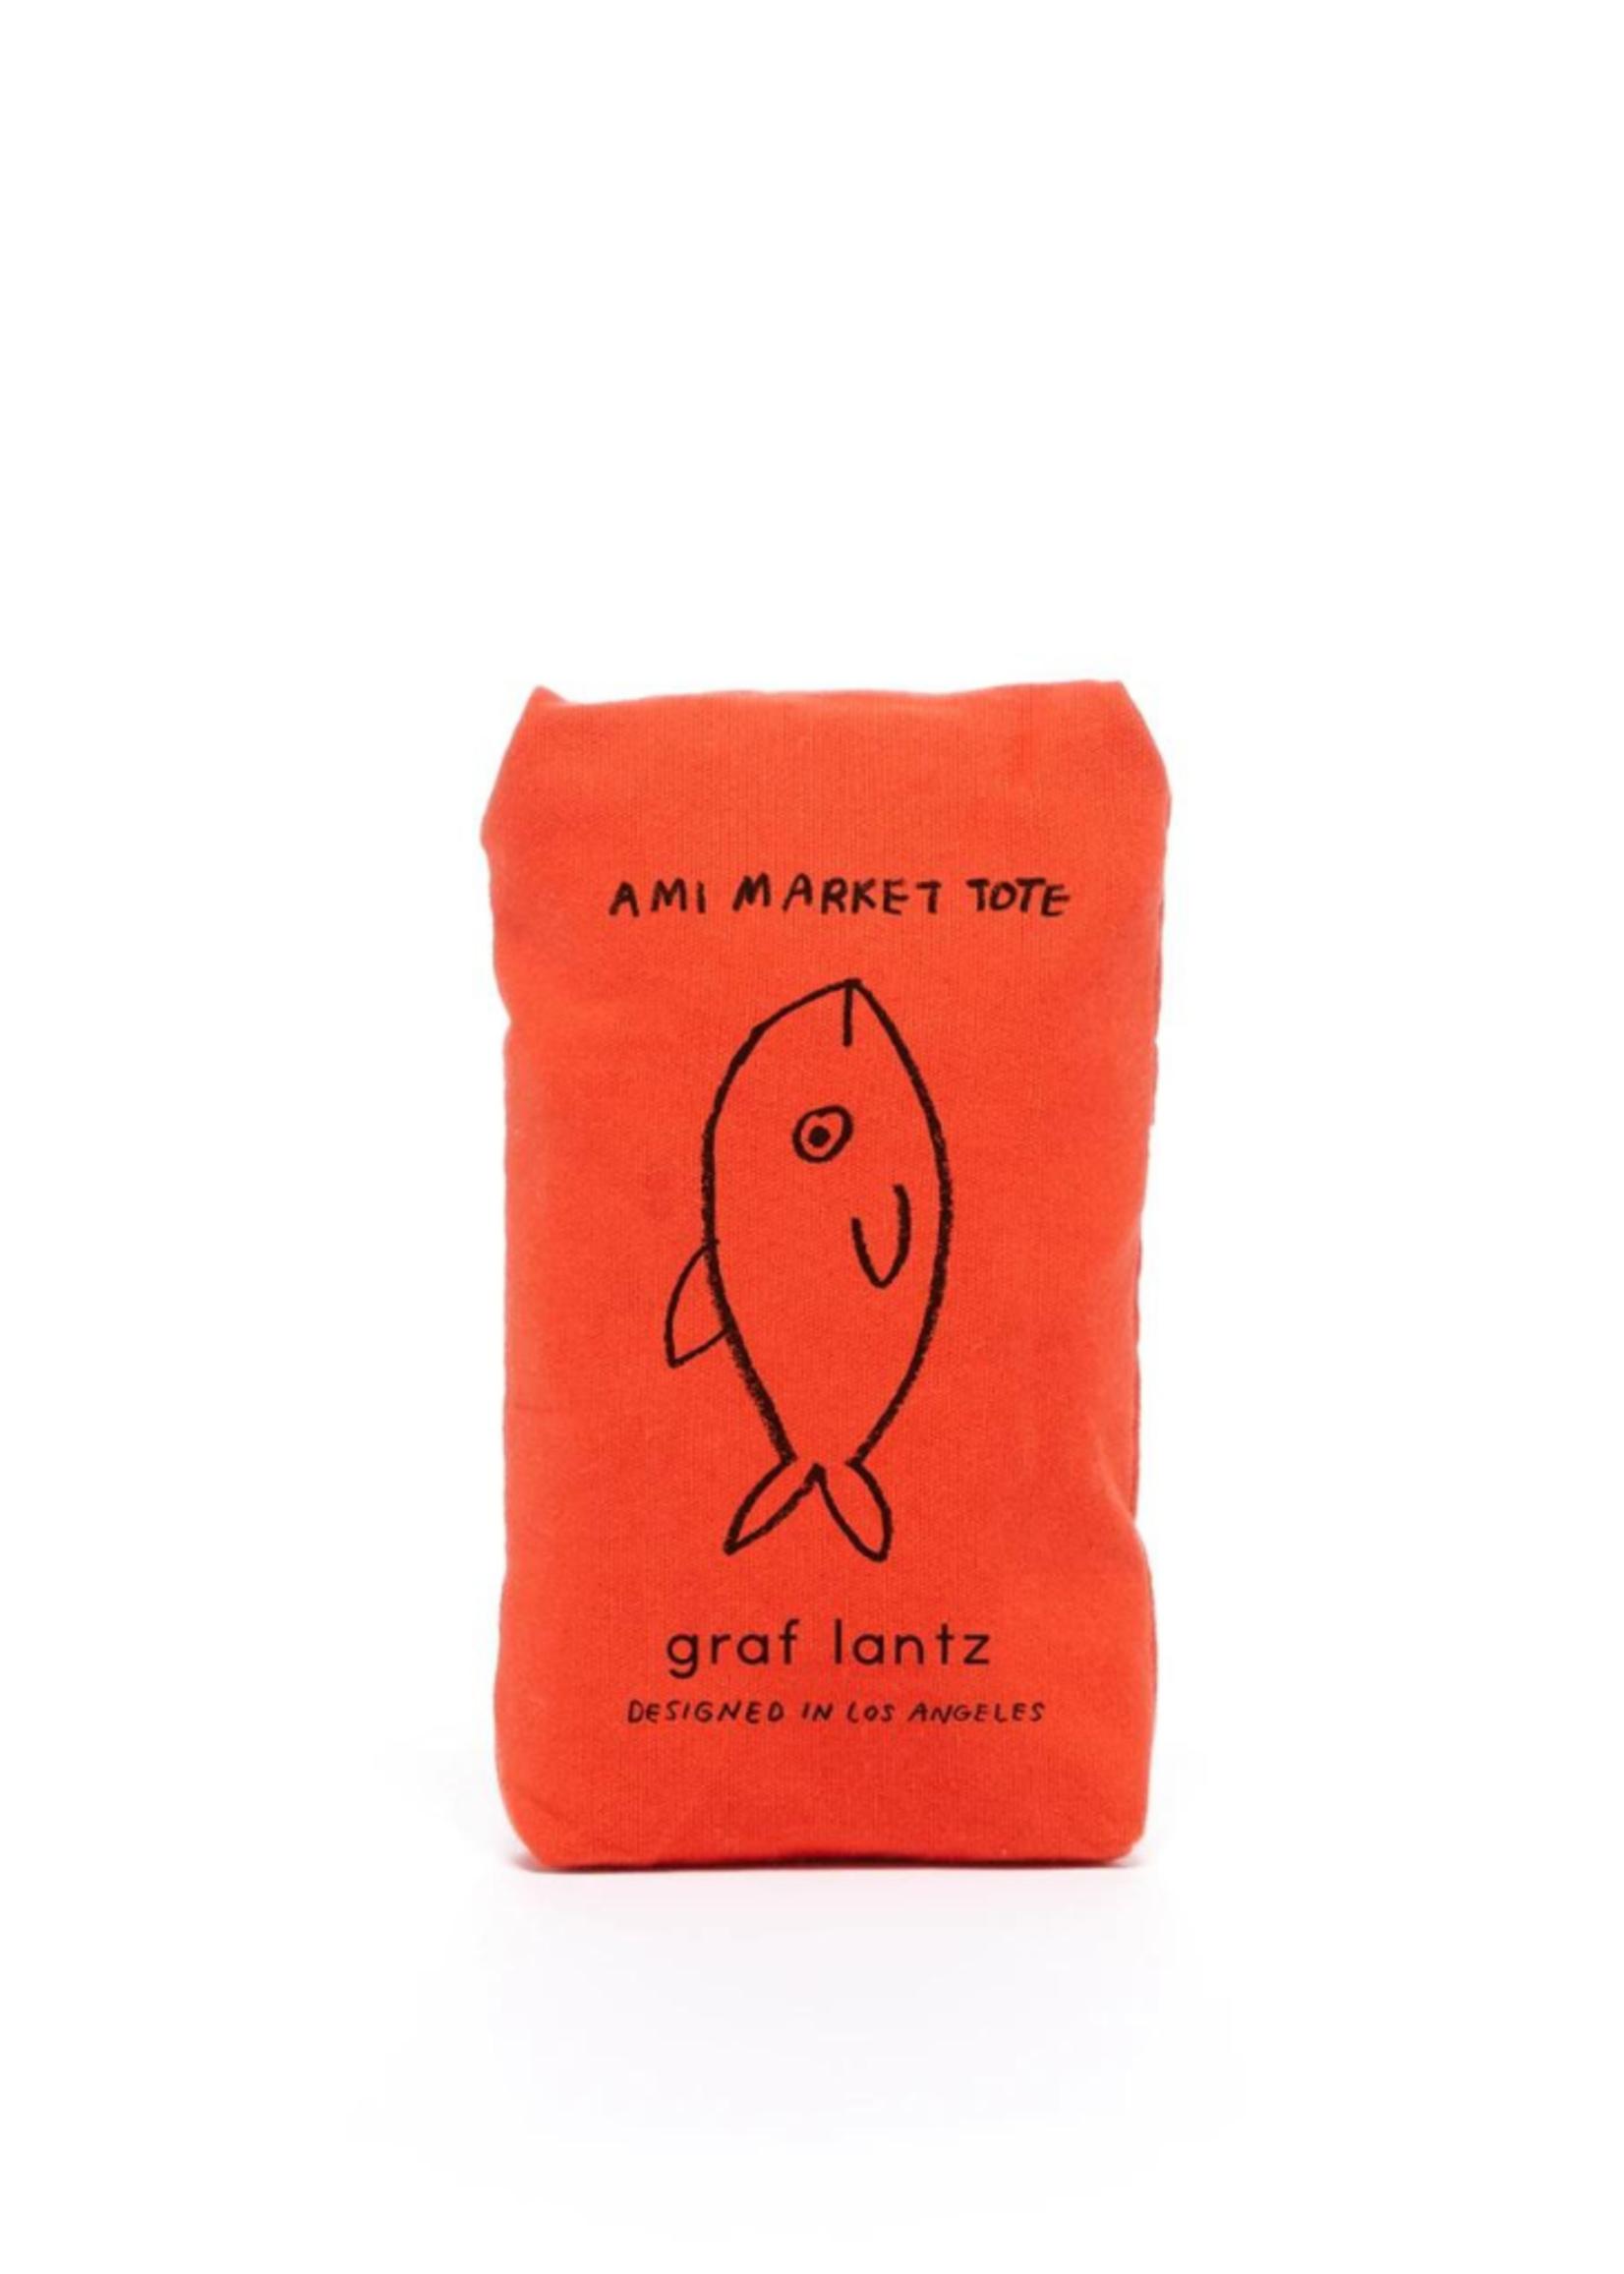 Graf&Lantz Ami Net Market Tote Orange